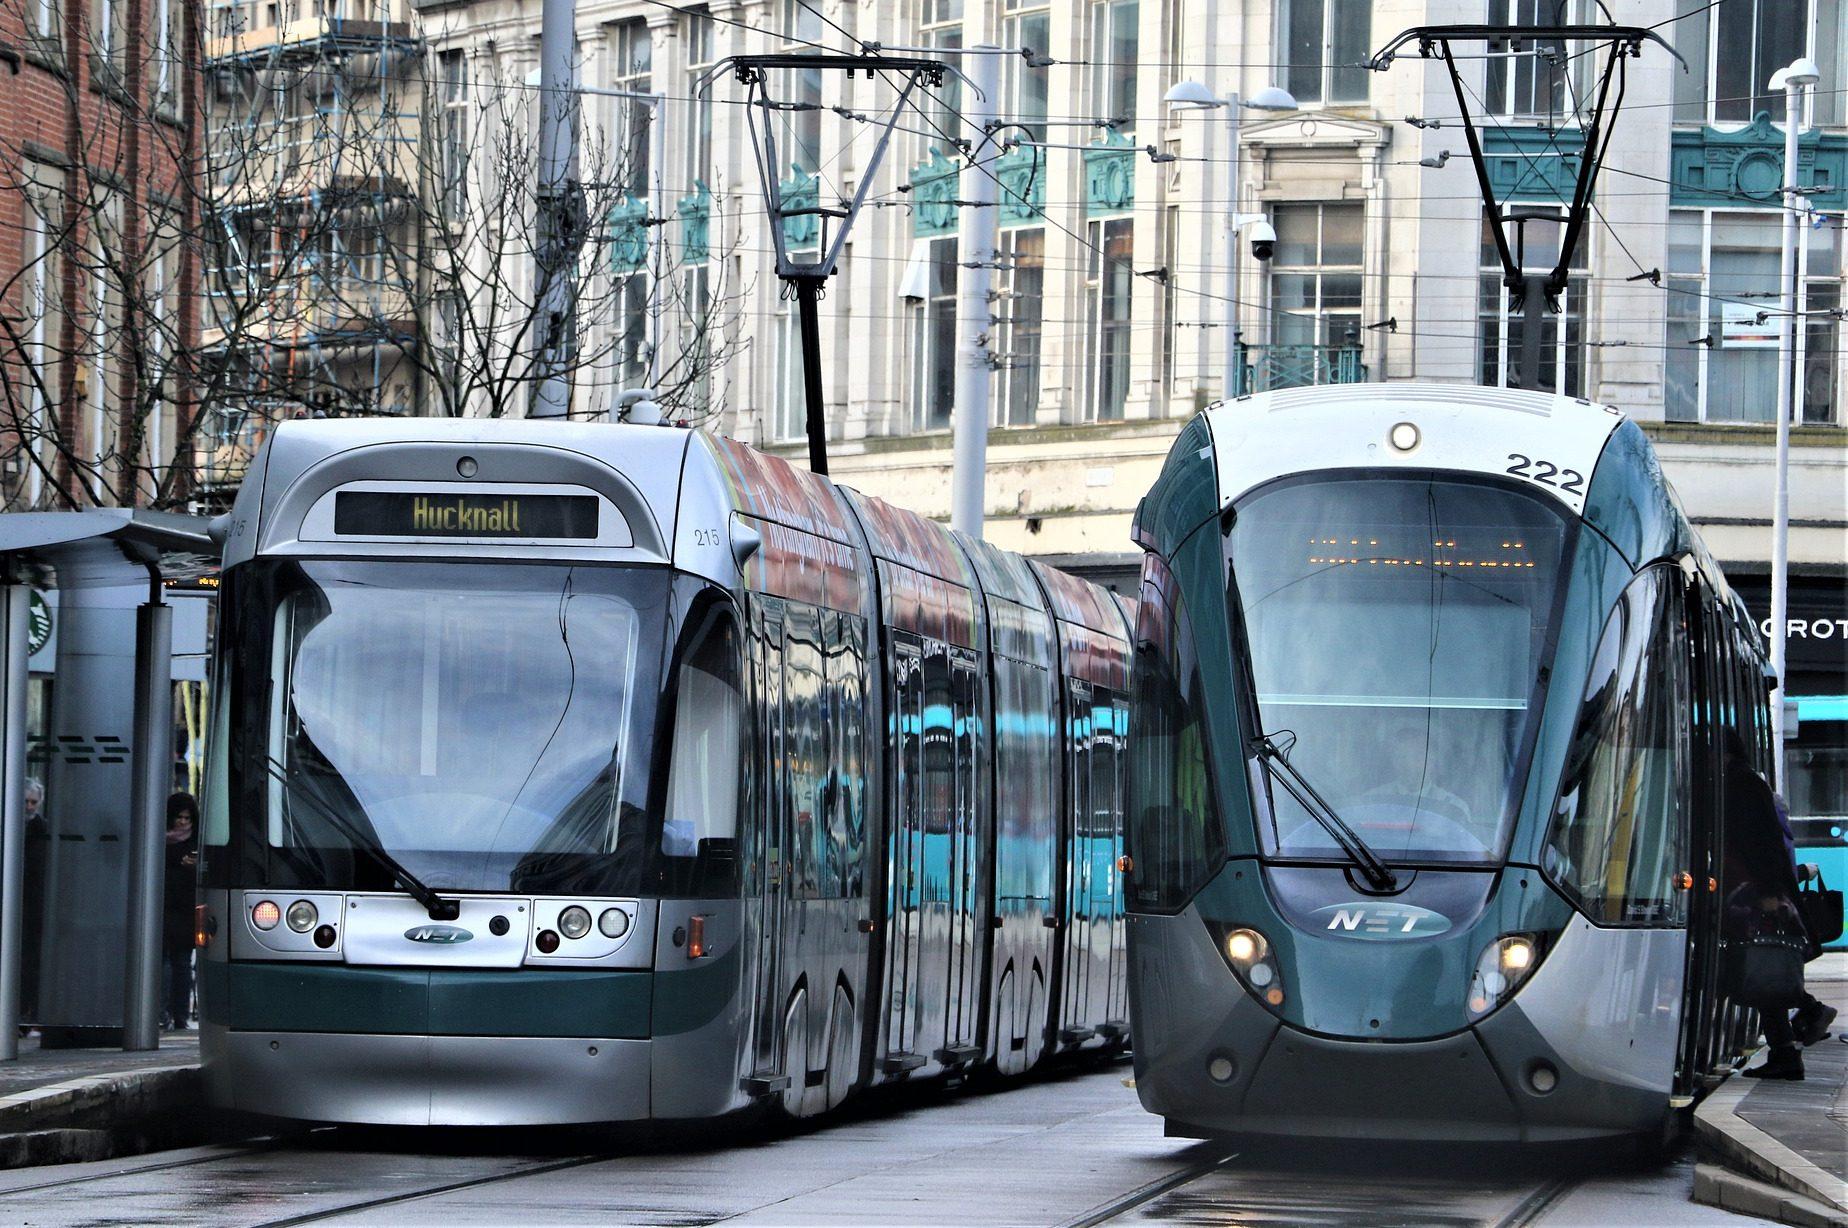 Nottingham's electric tram. Credit: David Reed on Pixabay.